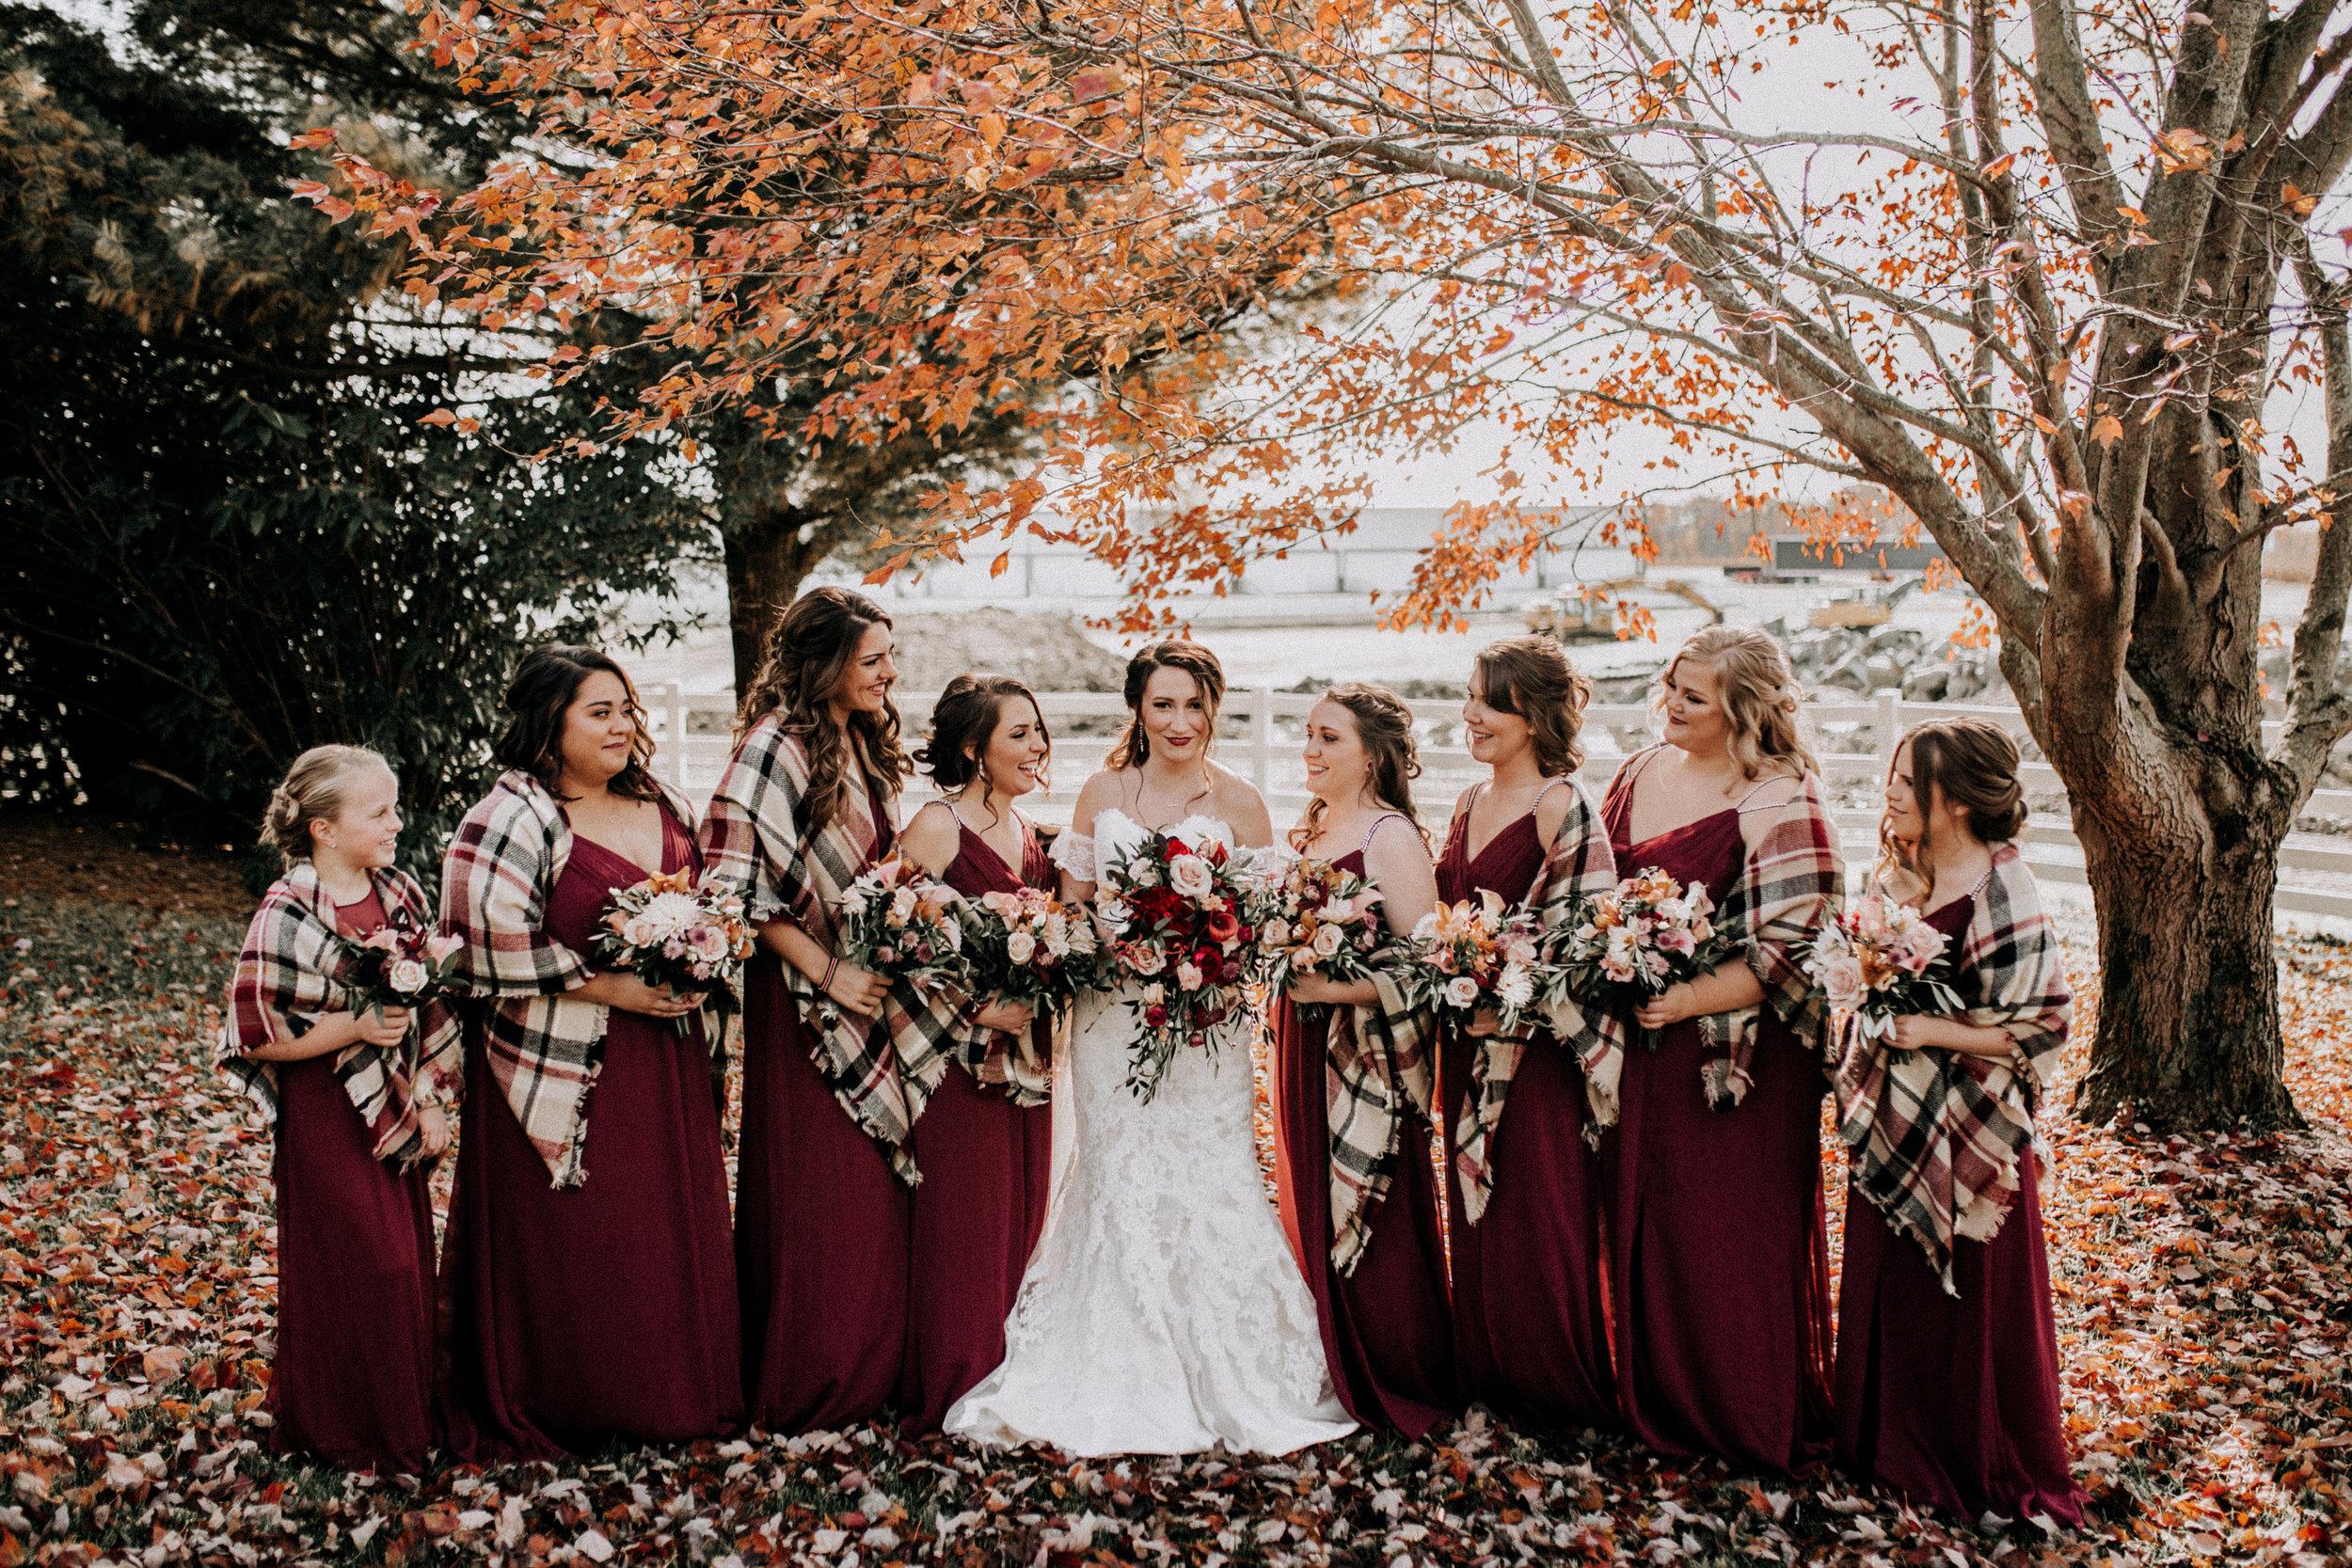 rustic wedding fall colors bridesmaids.jpg